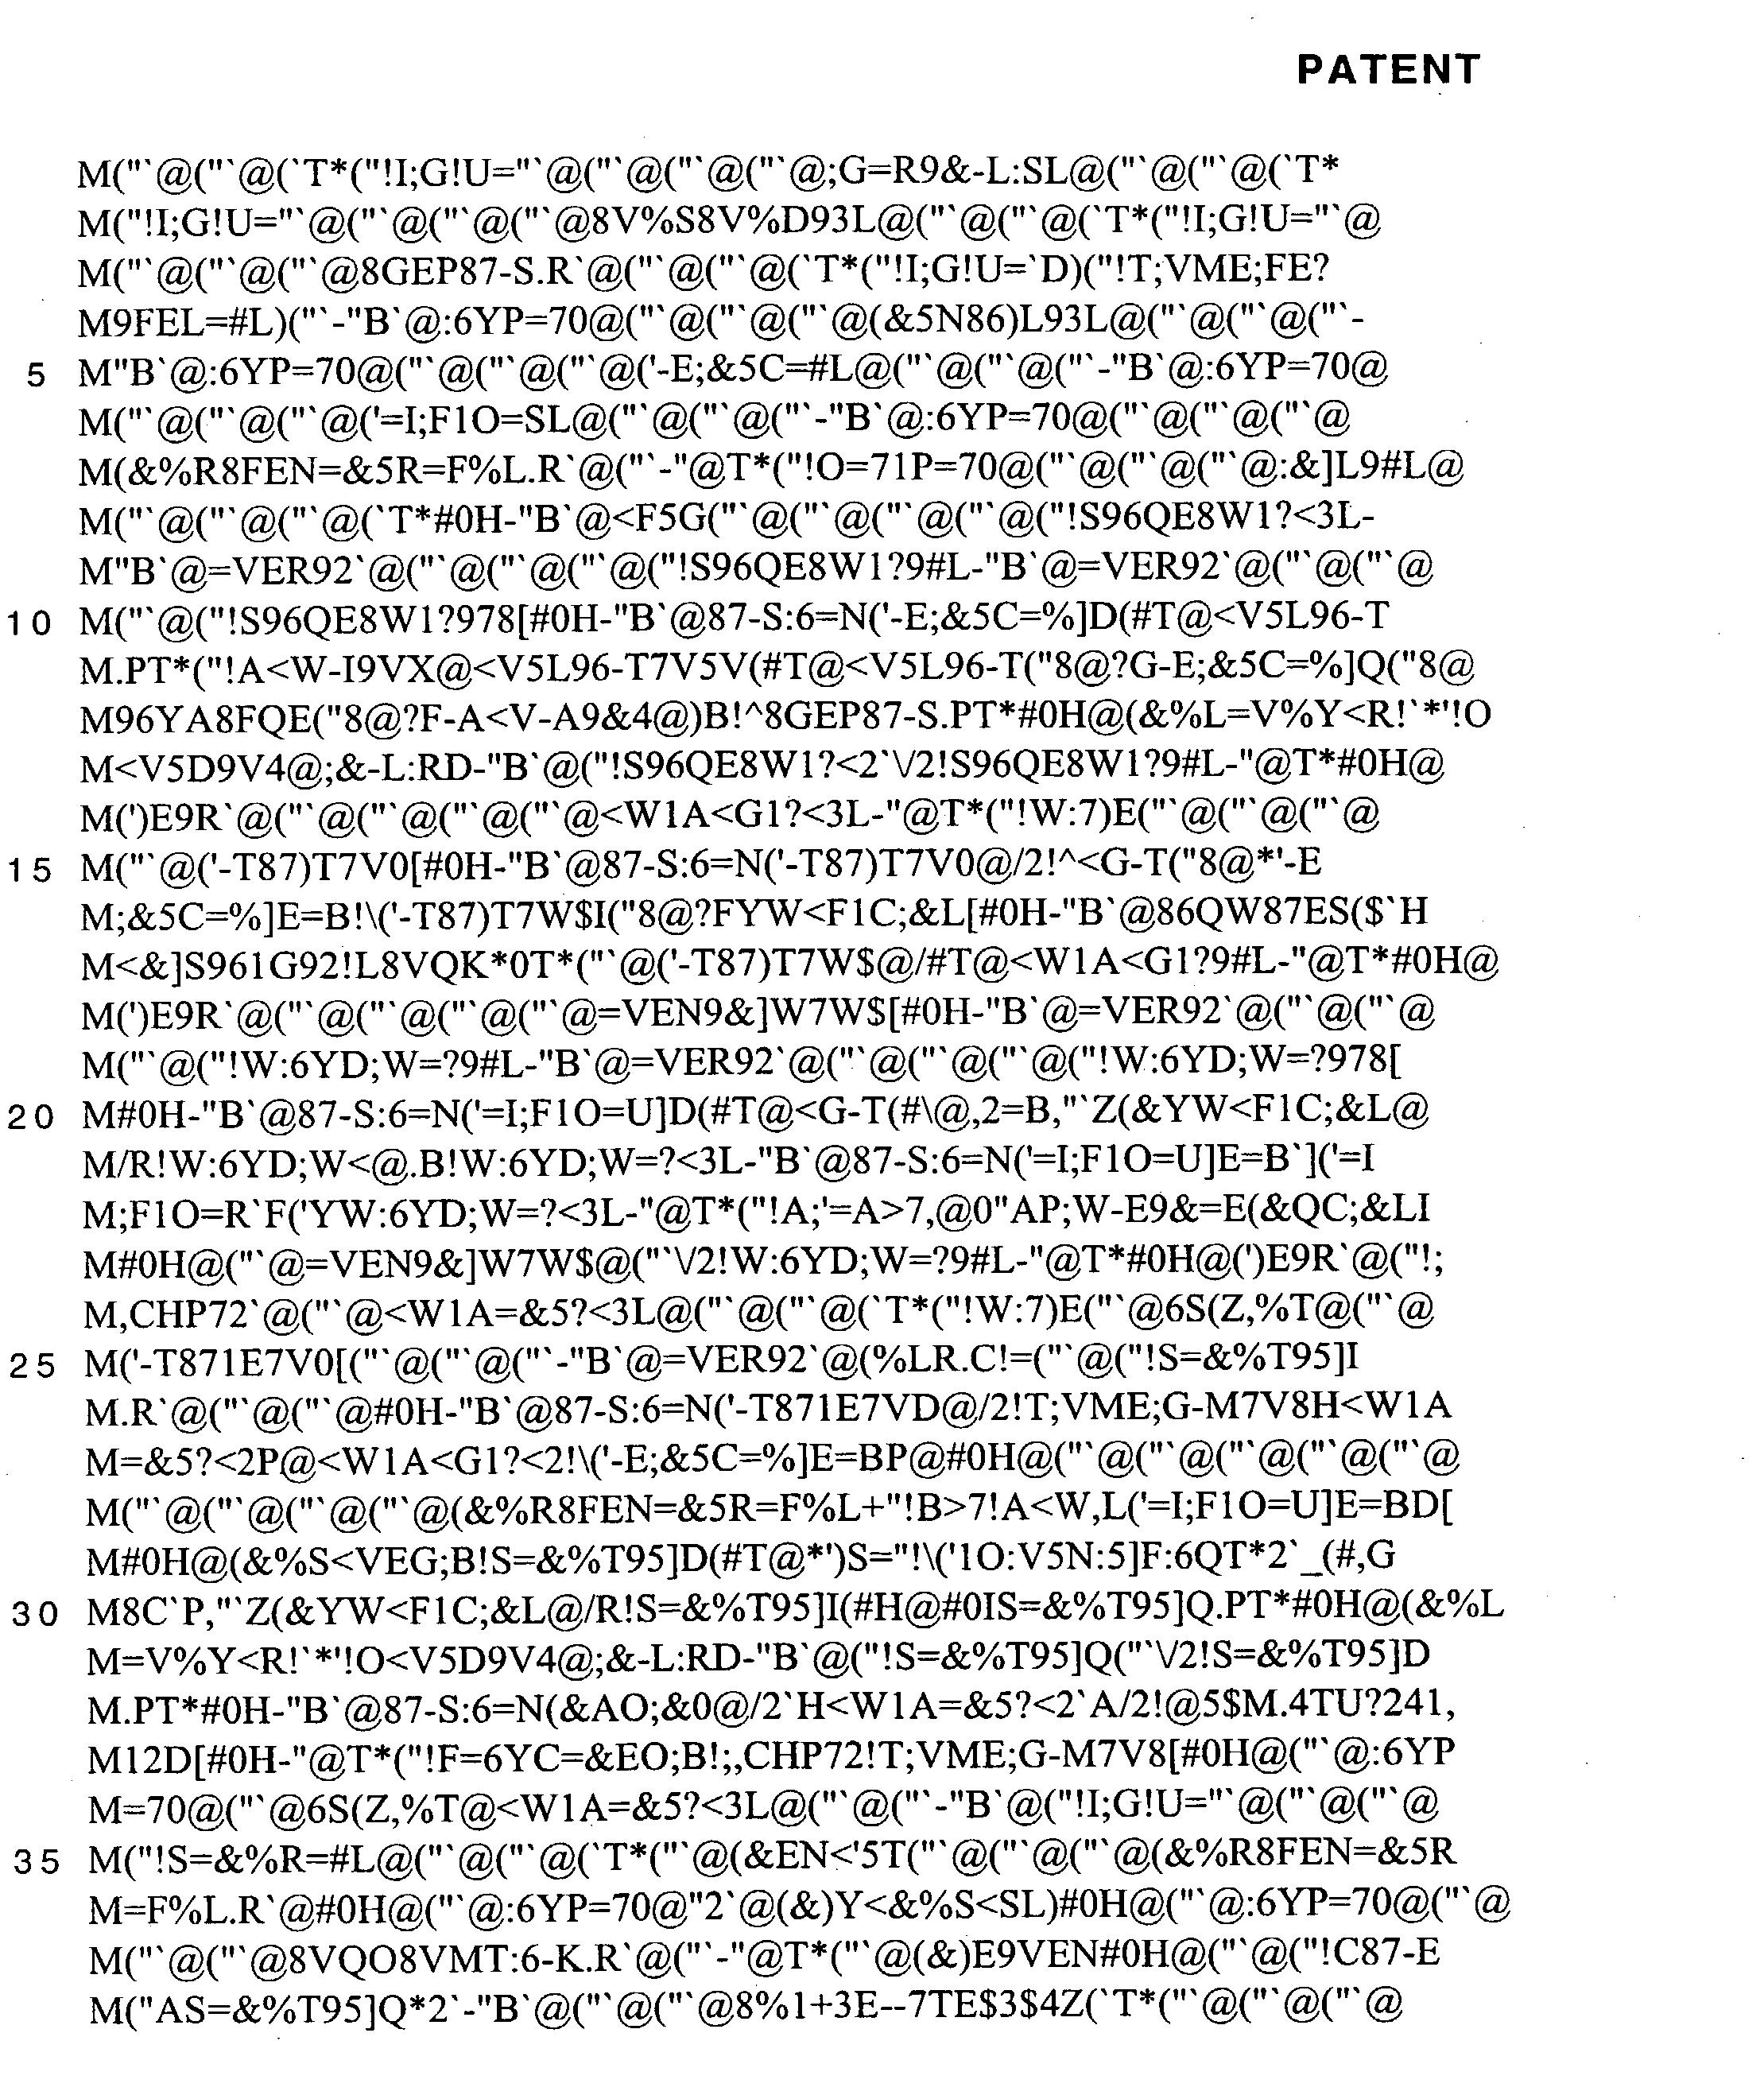 Figure US20030174721A1-20030918-P00009